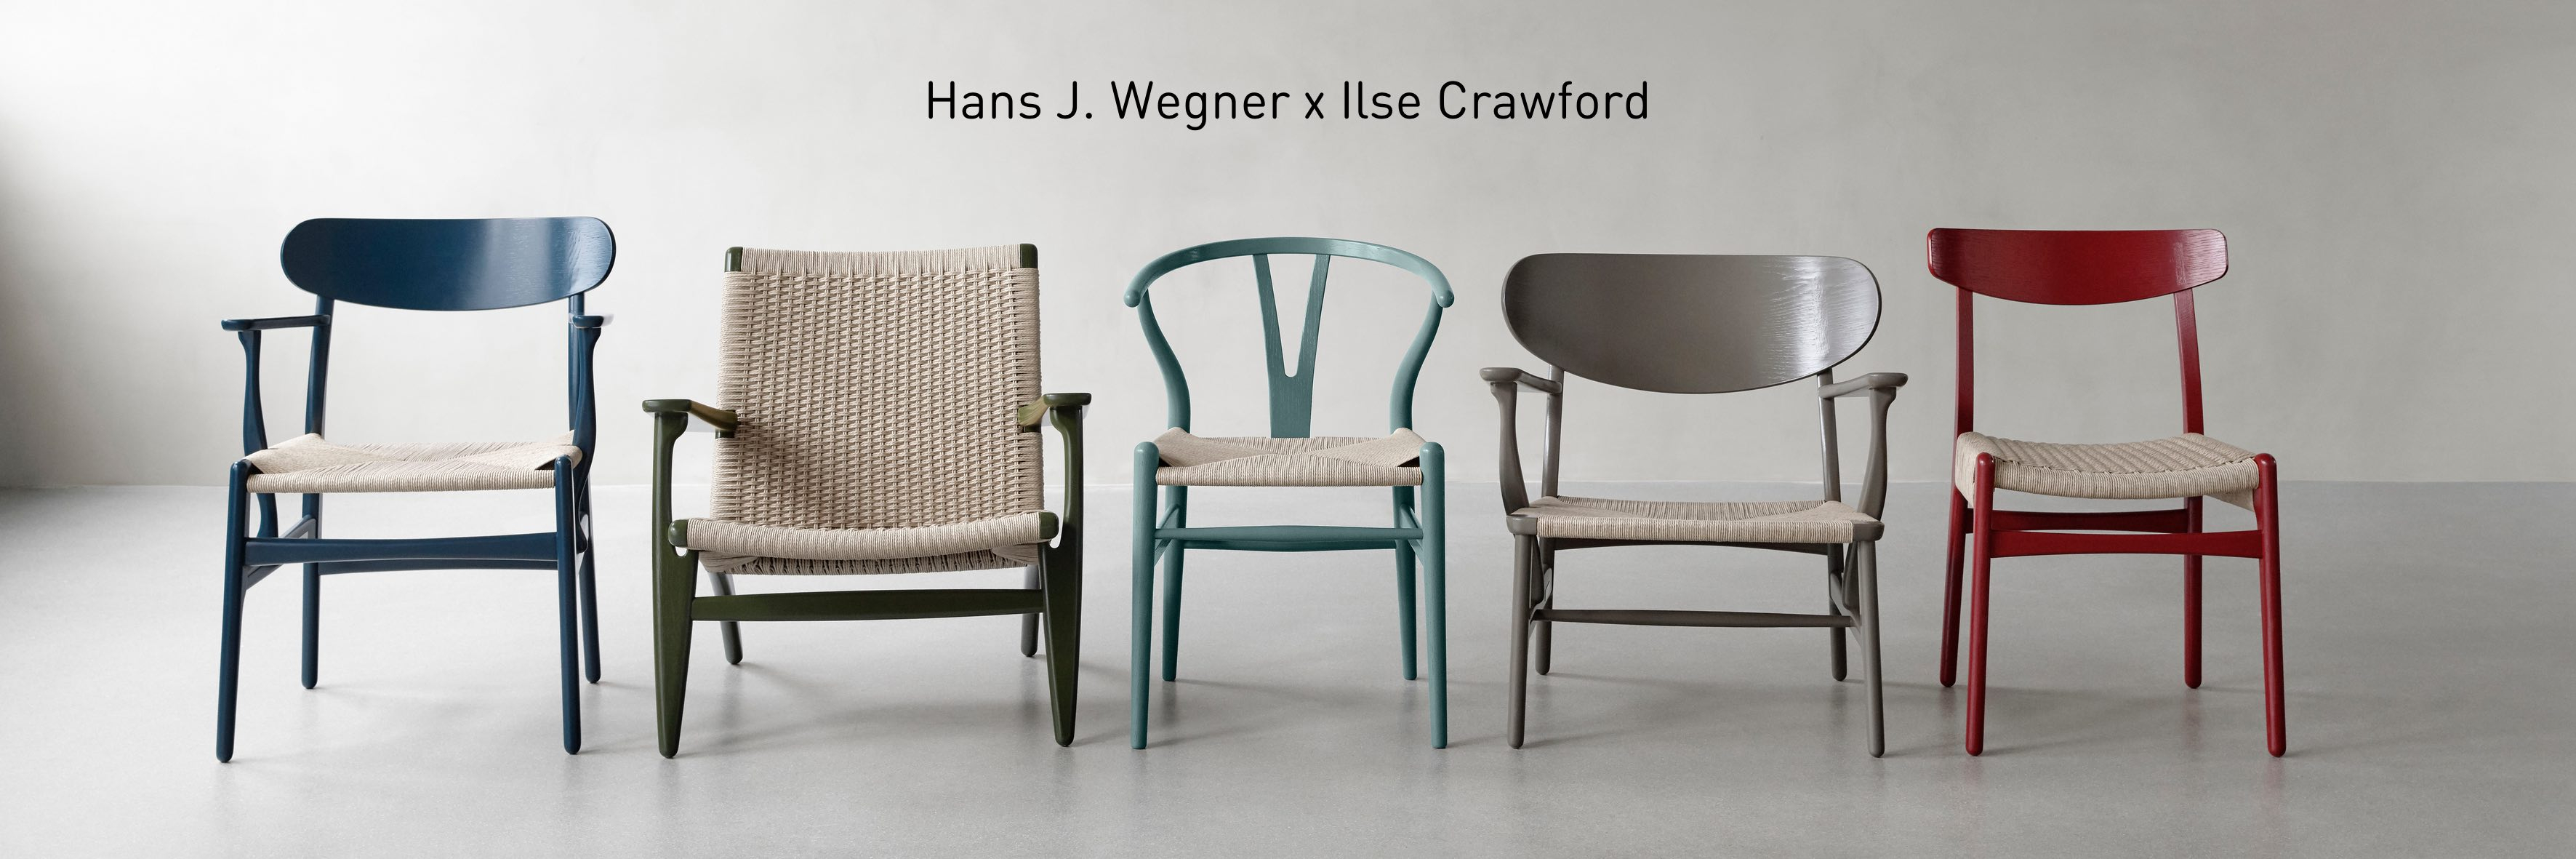 Wegner x Ilse Crawford